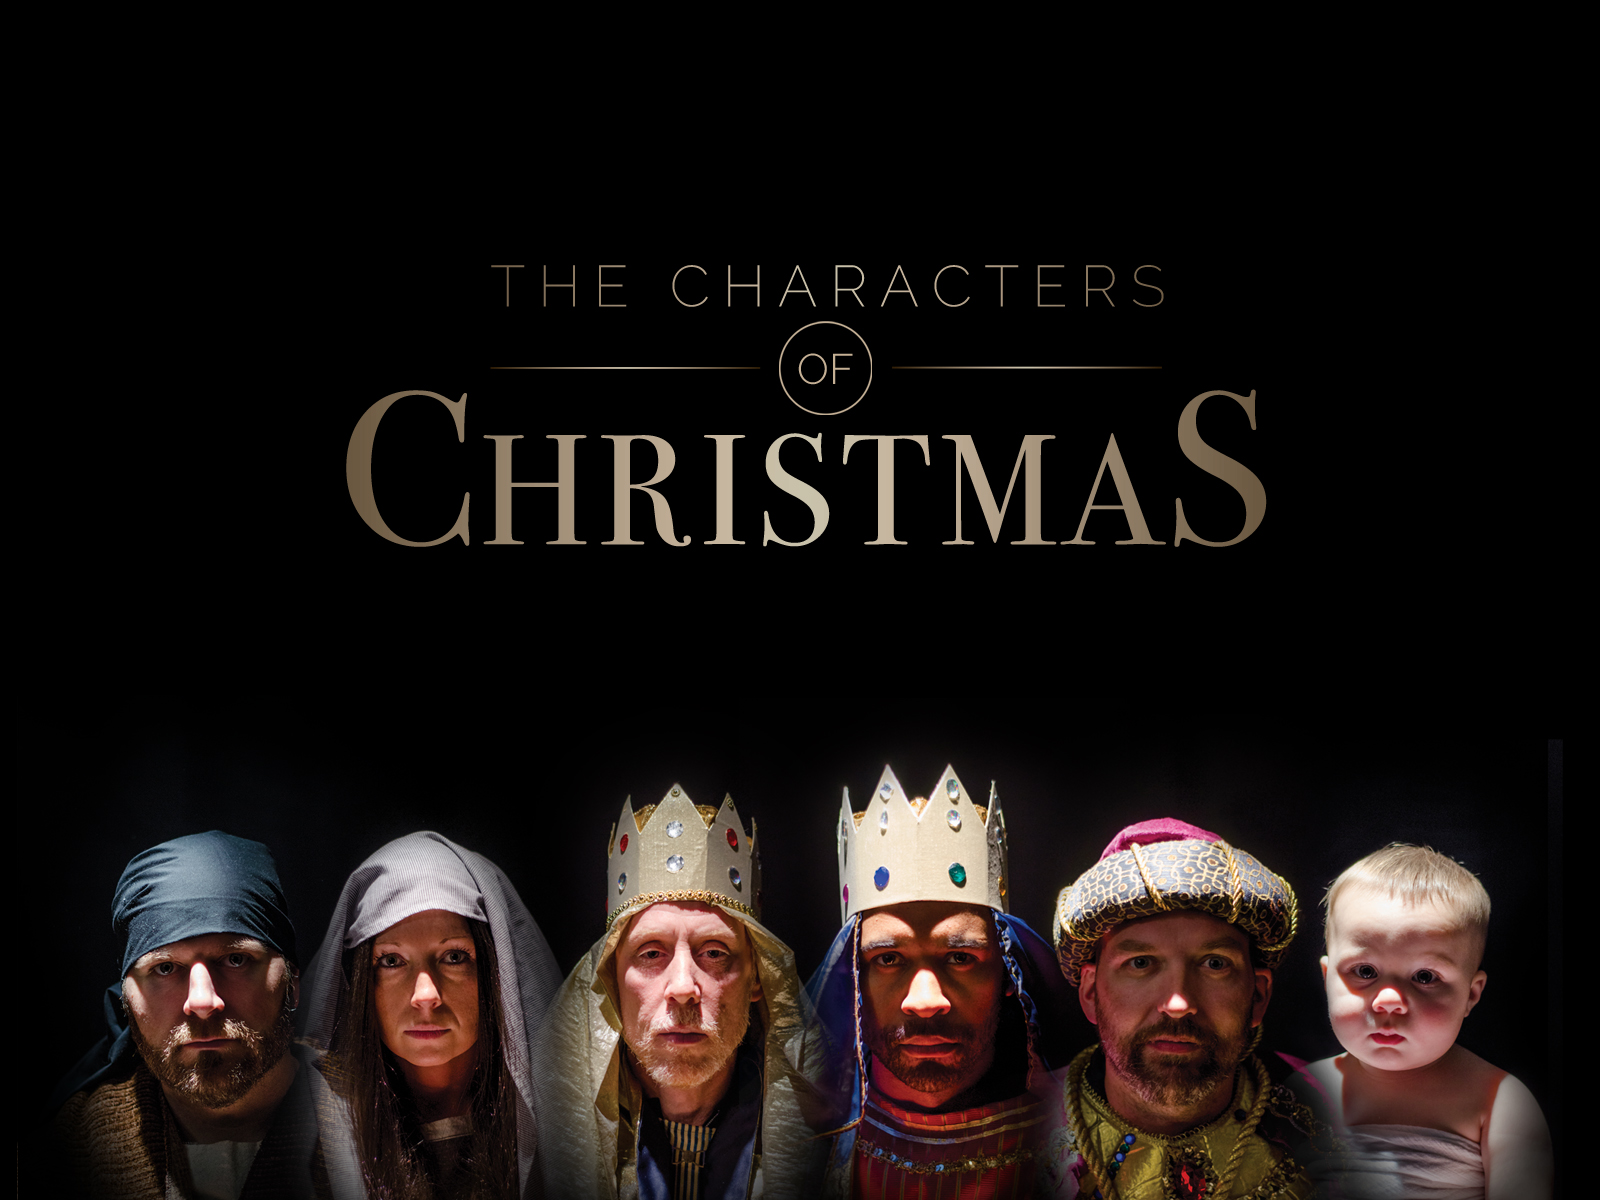 Wallpaper_Desktop_Standard_The_Characters_of_Christmas.jpg